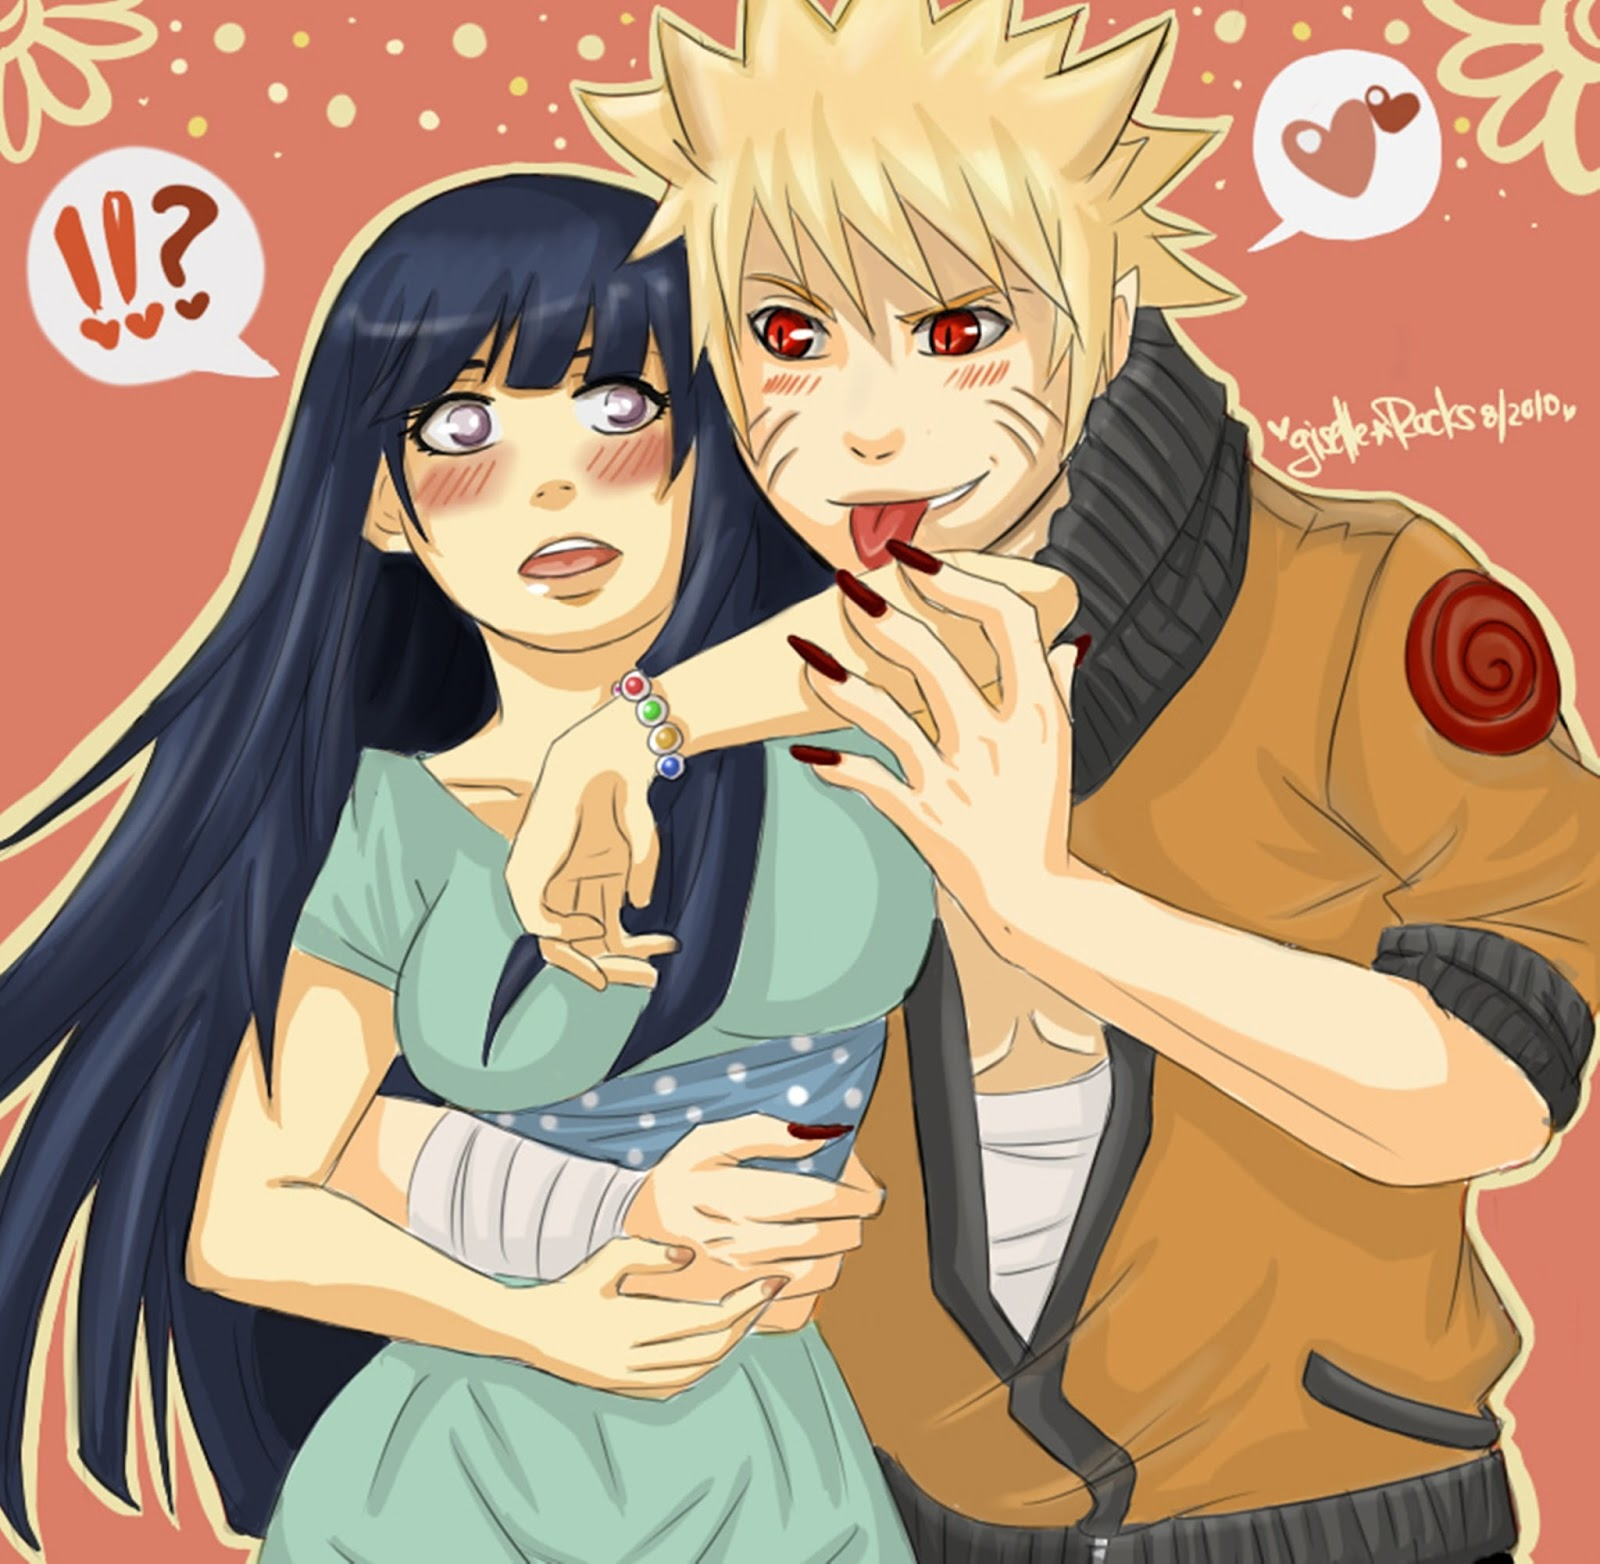 Gambar Kartun Naruto Romantis Nusagates